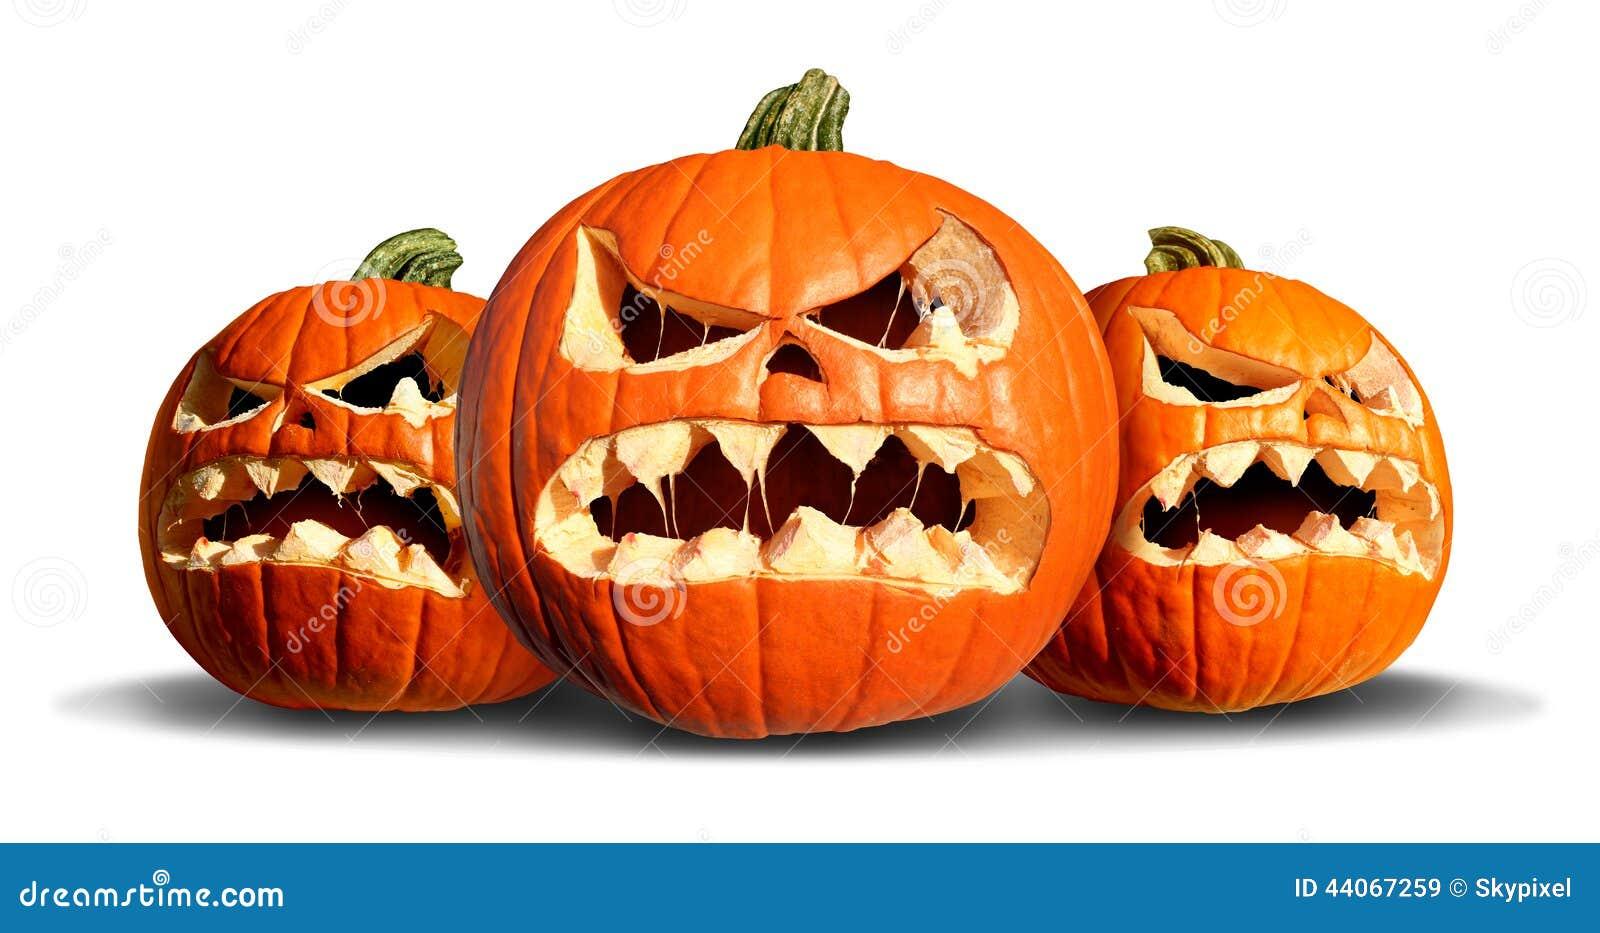 Pumpkin Monster Group Stock Illustration - Image: 44067259